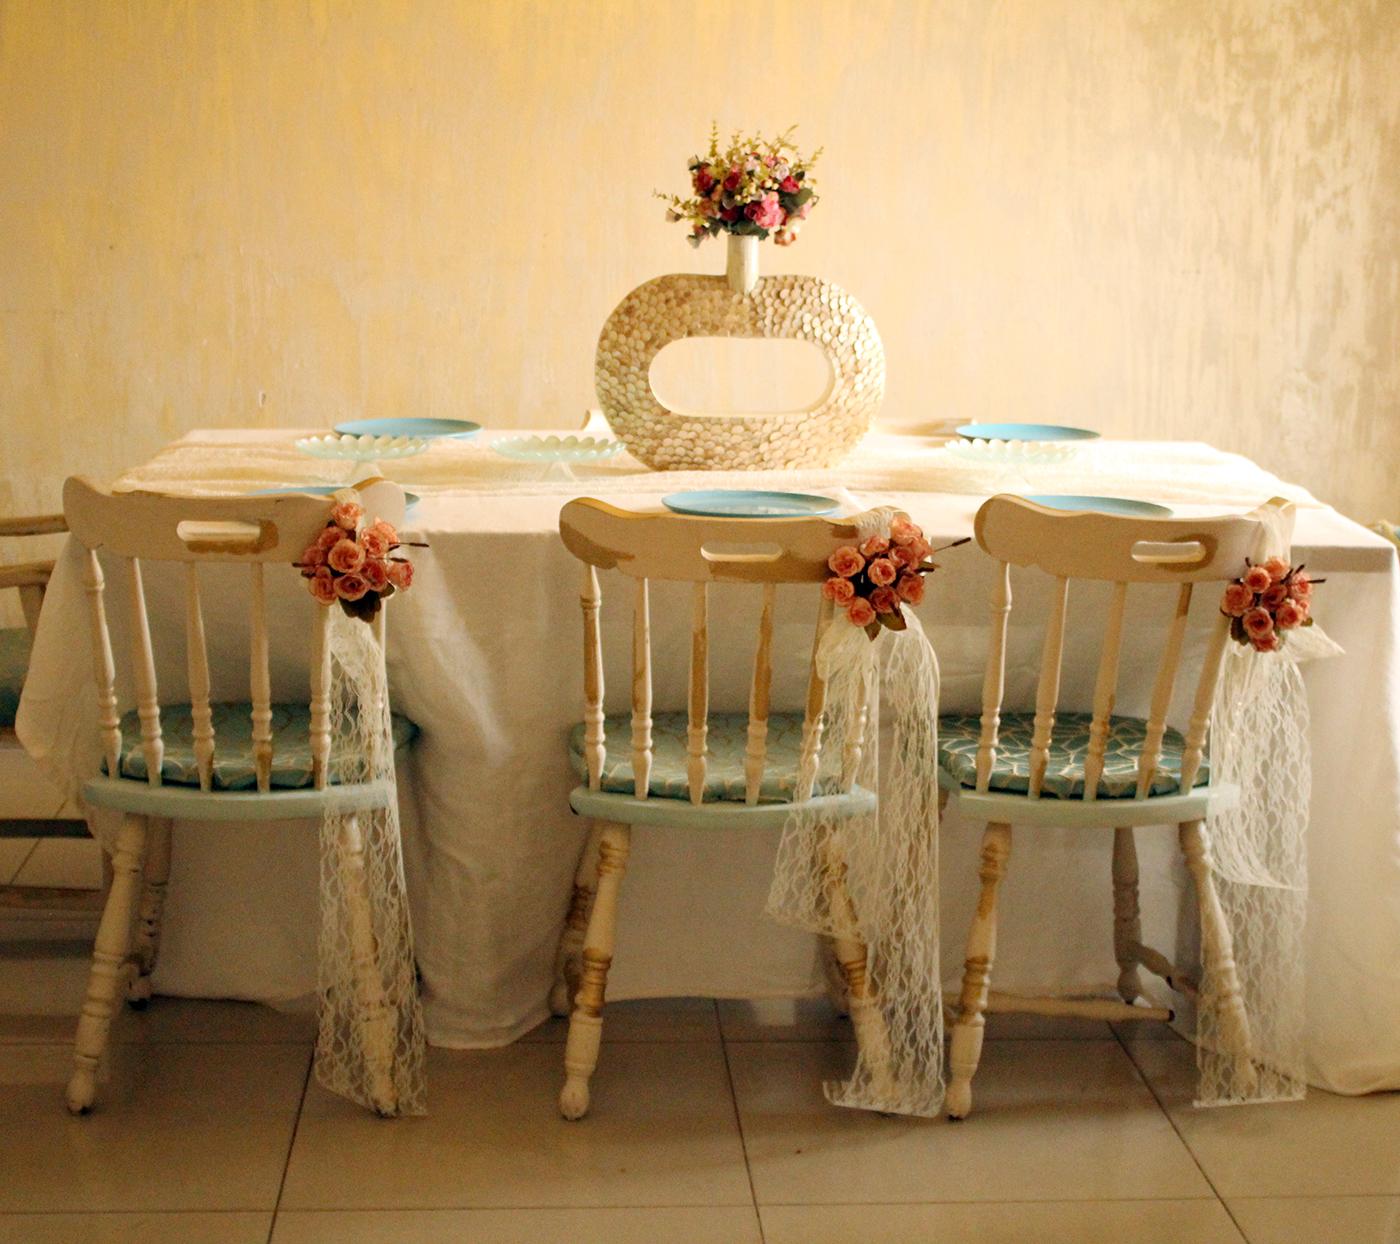 IMG 8084 - חידוש כסאות לפינת אוכל בסלון